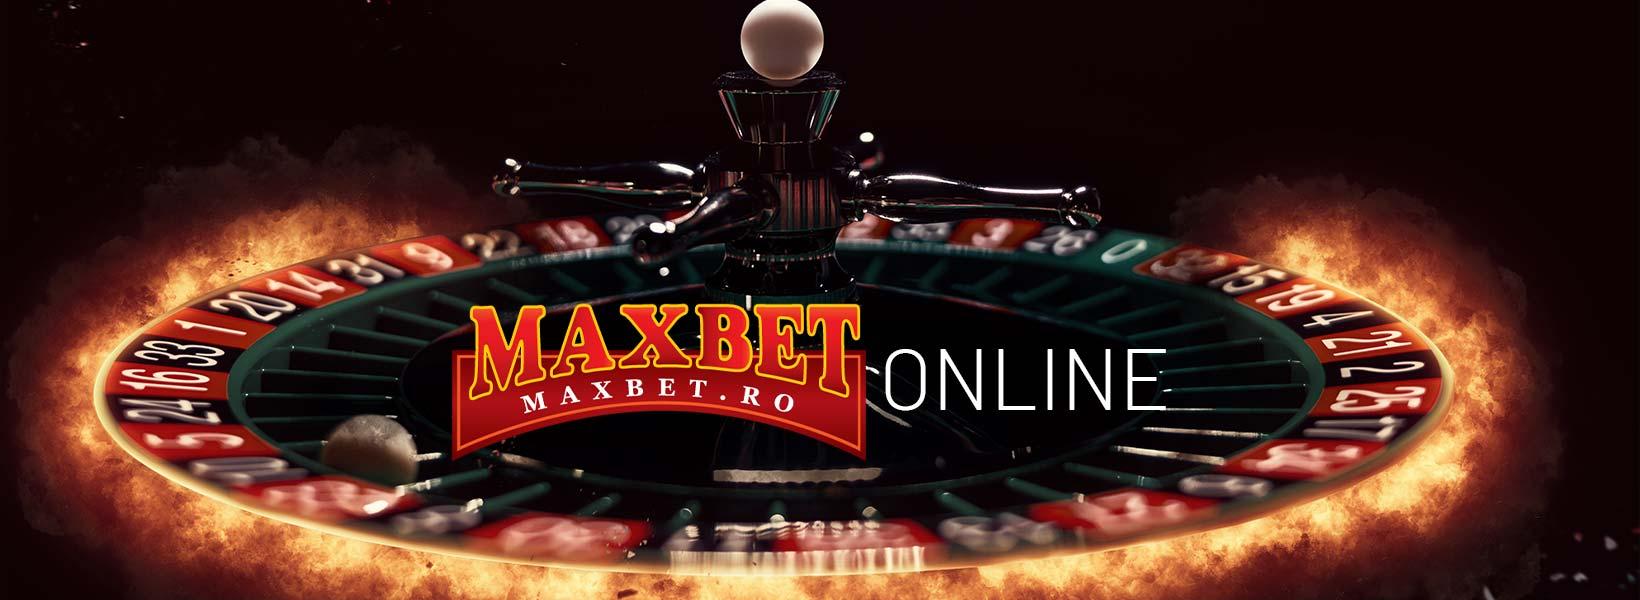 ruletă maxbet gratis